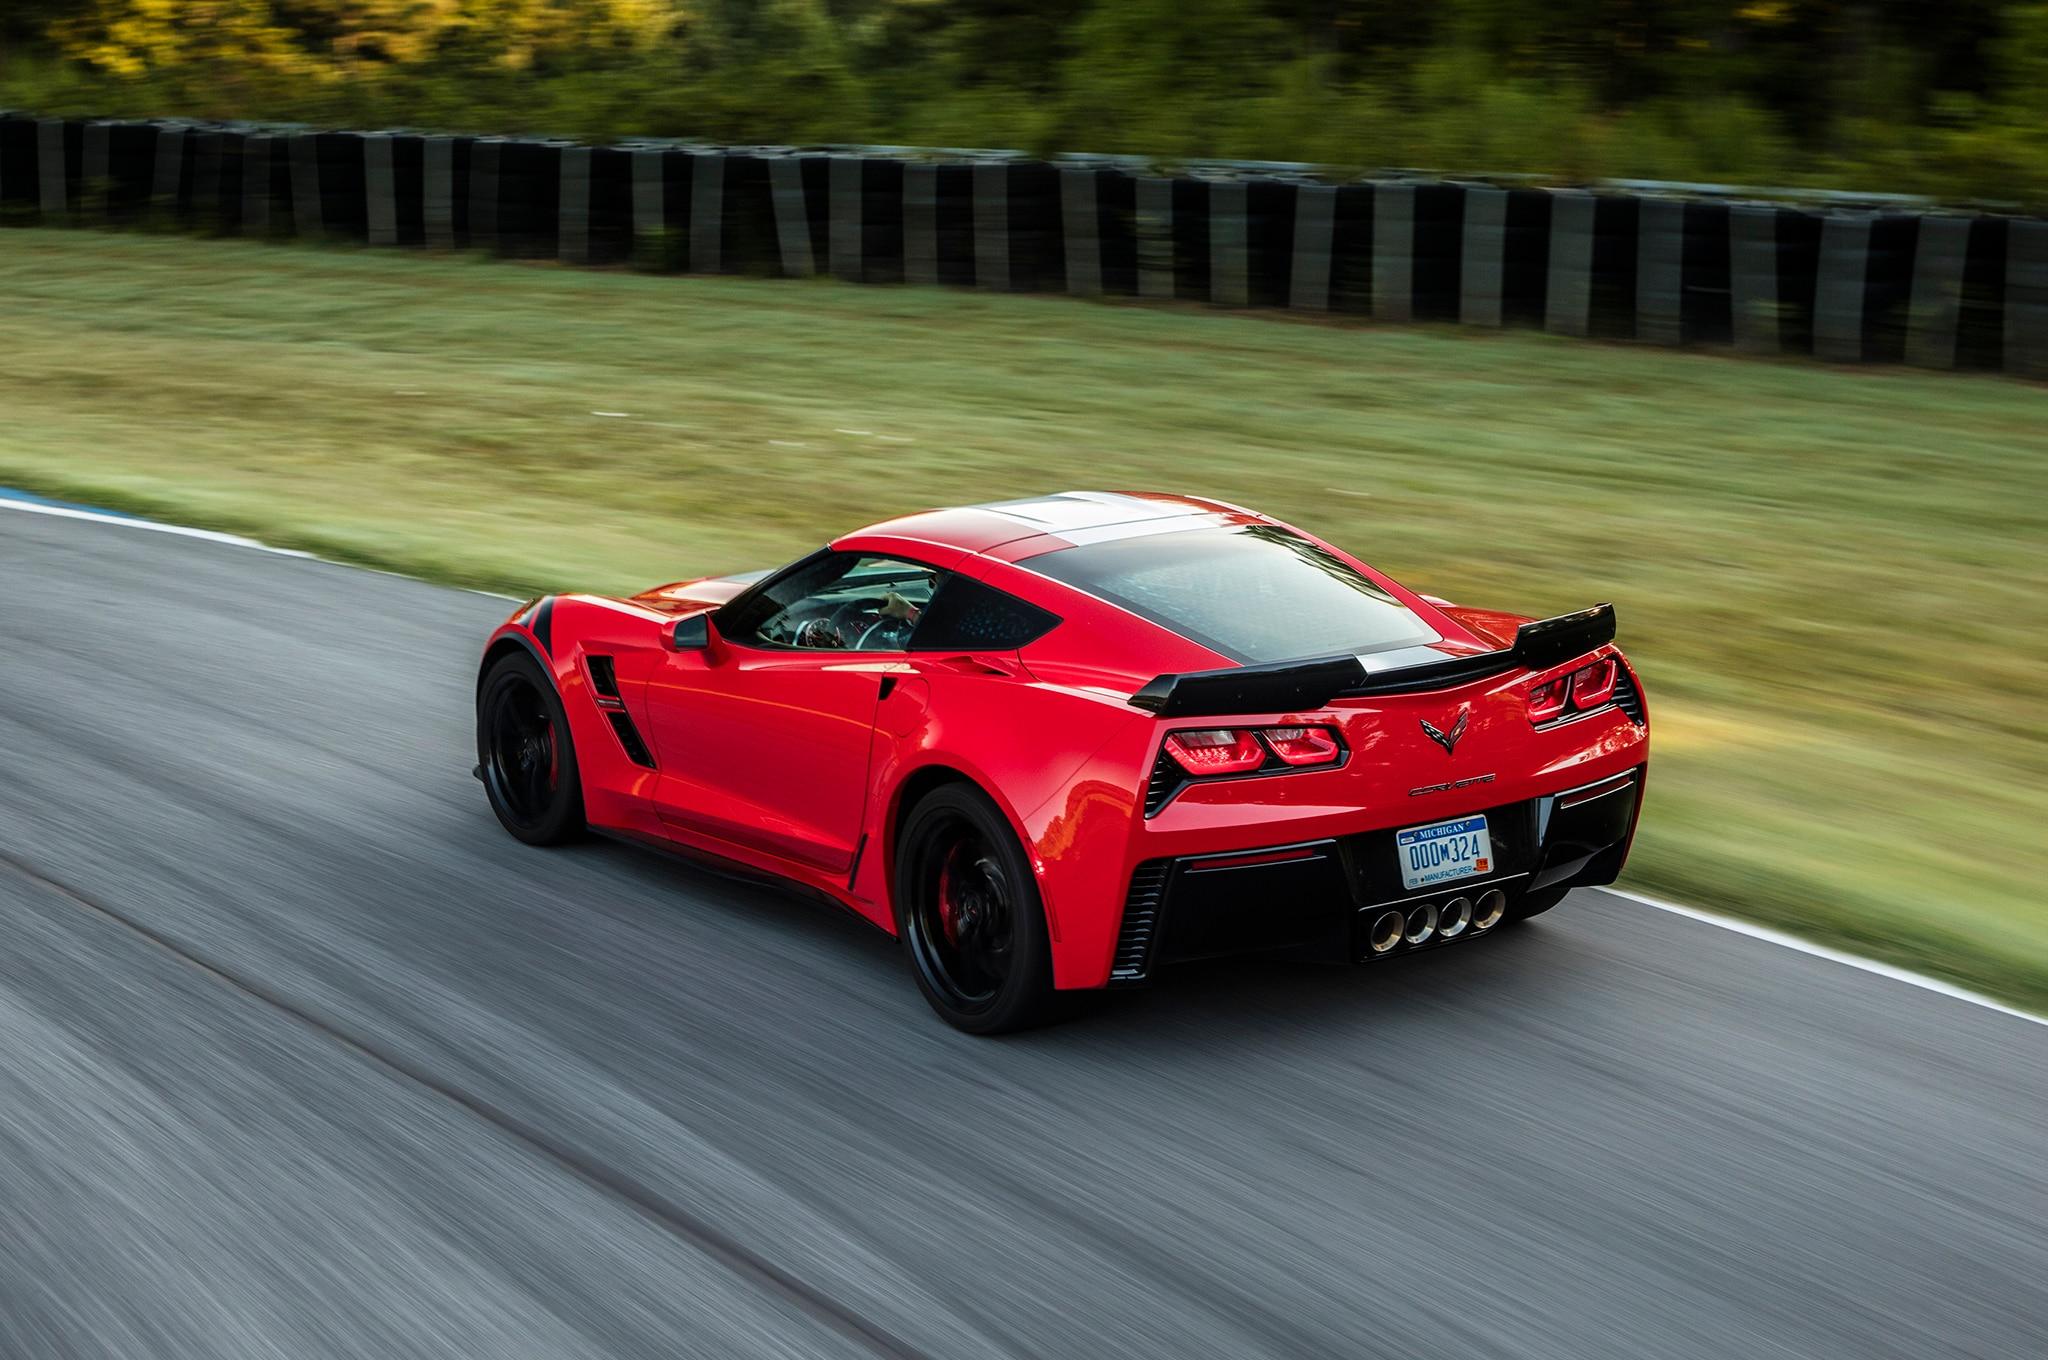 2017 Chevrolet Corvette Grand Sport First Drive